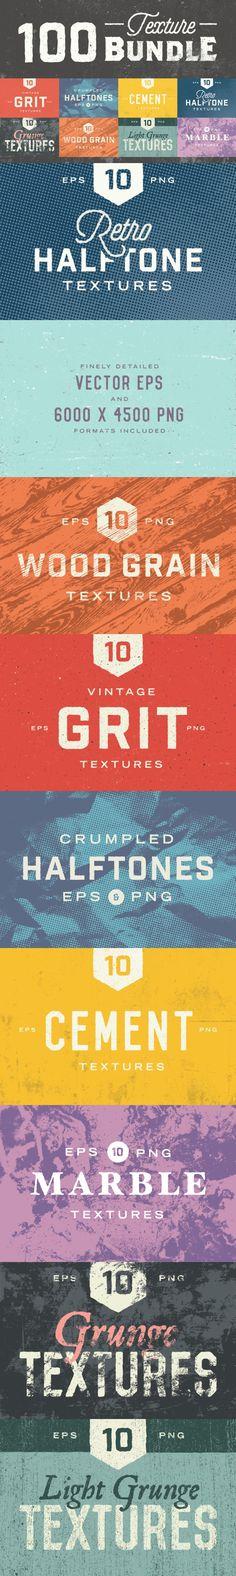 100 Texture Bundle. Textures. $29.00